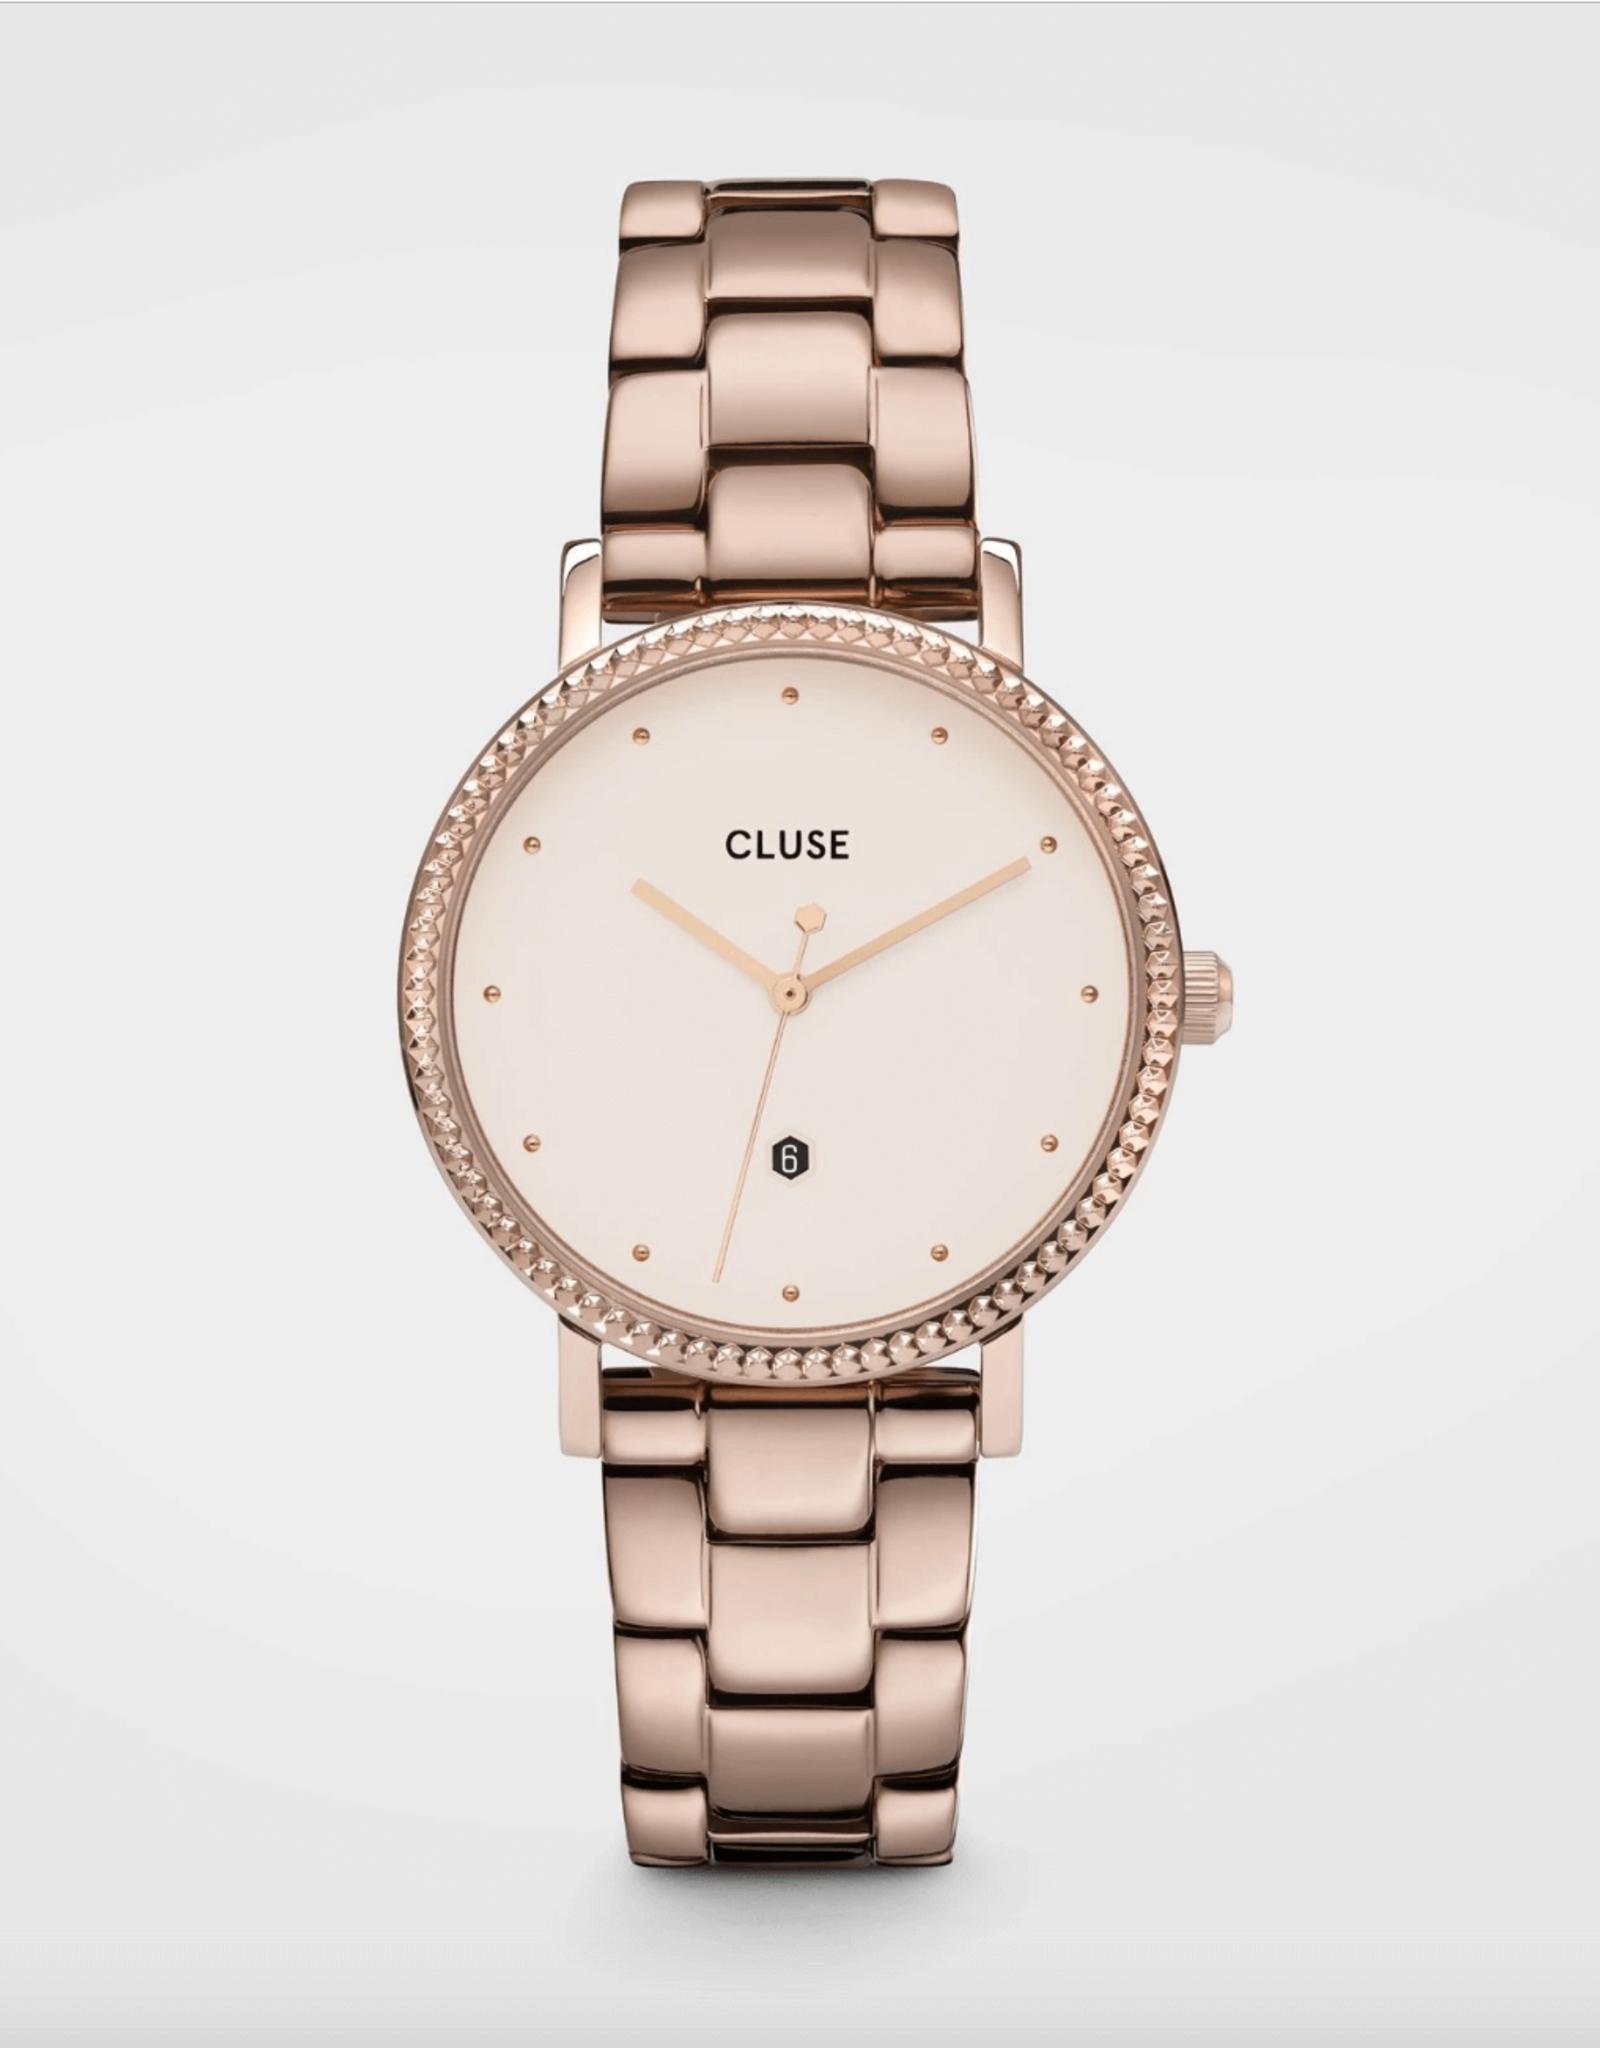 Cluse Cluse - Le Couronnement, Rose Gold, Winterwhite/Rose gold